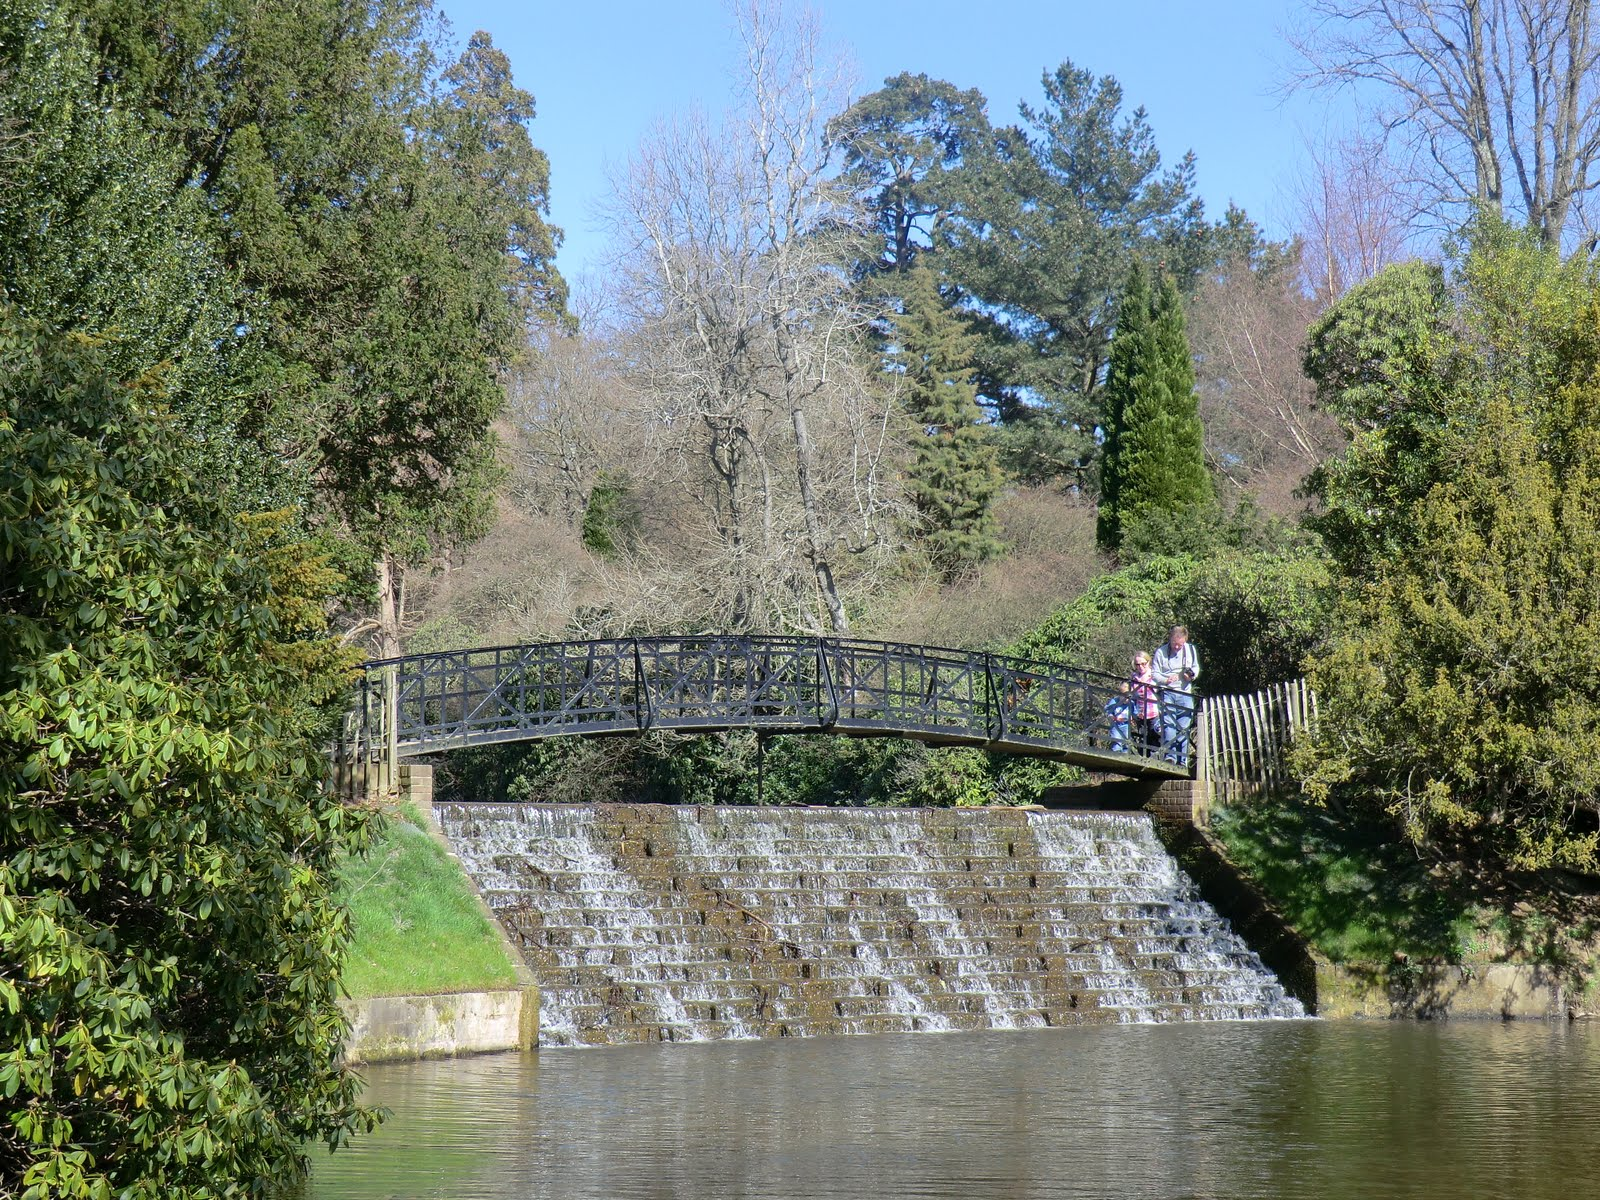 CIMG2298 Cascade Bridge, Sheffield Park and Garden